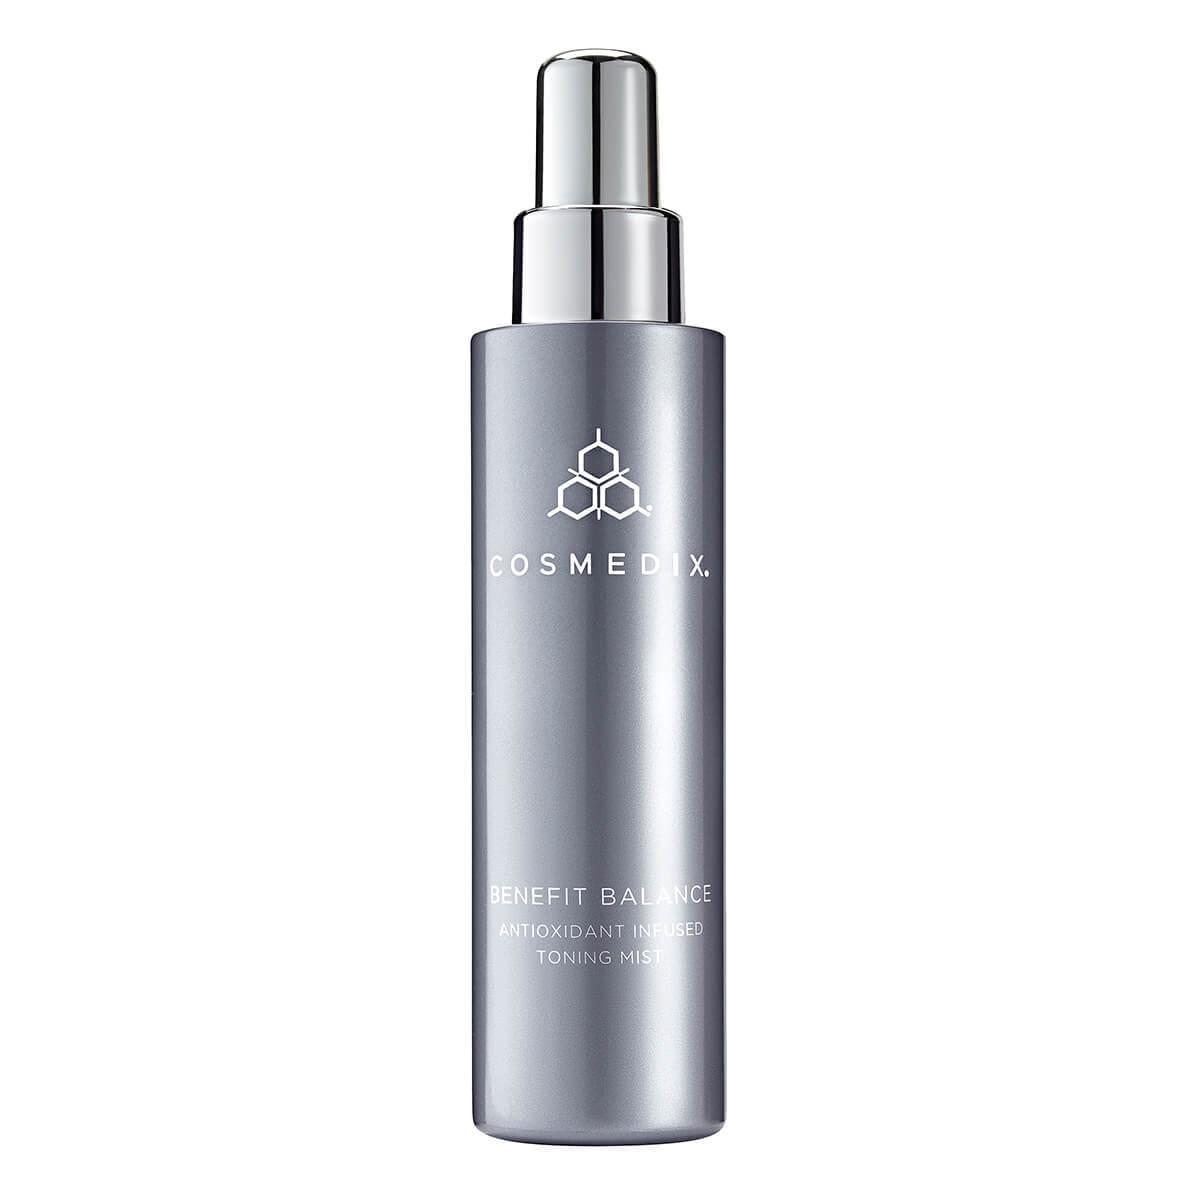 Тоник мист Cosmedix Benefit Balance Antioxidant Infused Toning Mist 150 мл